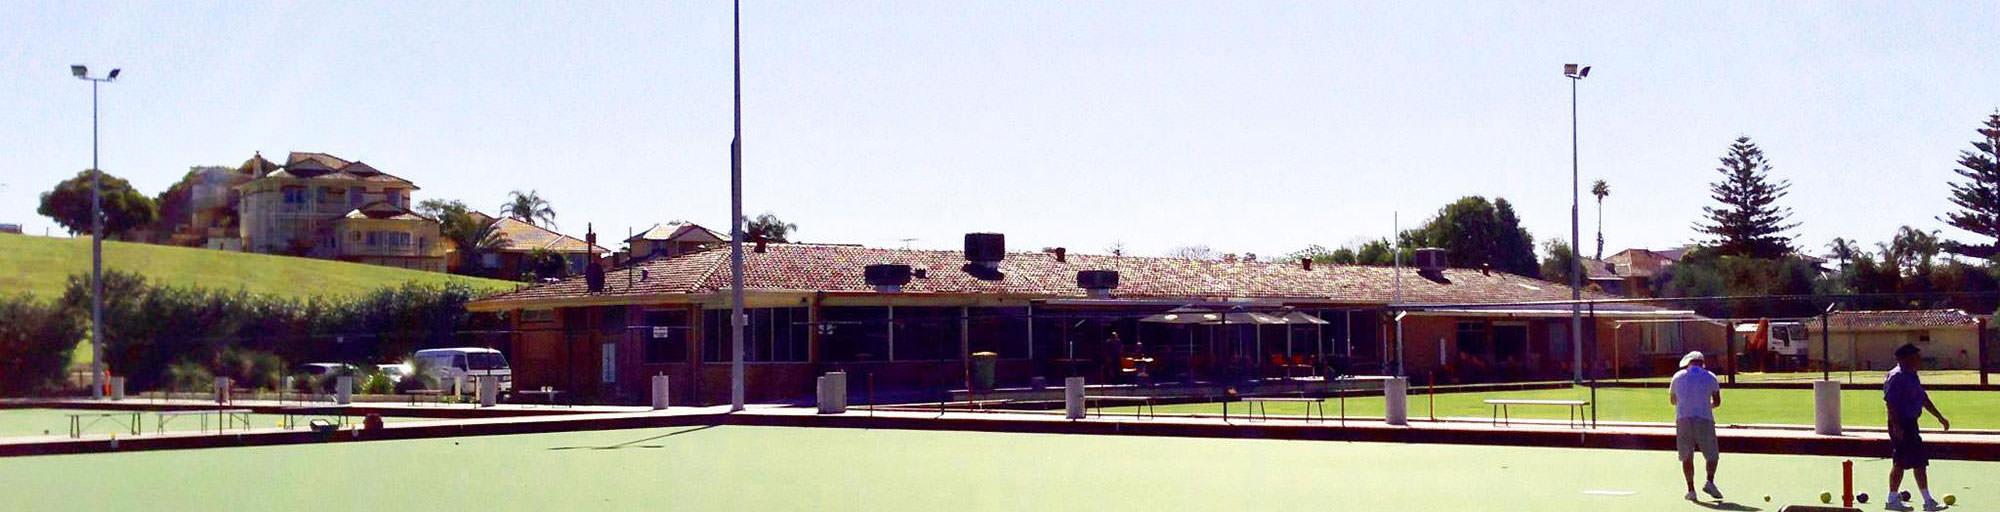 LMRC-View-towards-club-house-1